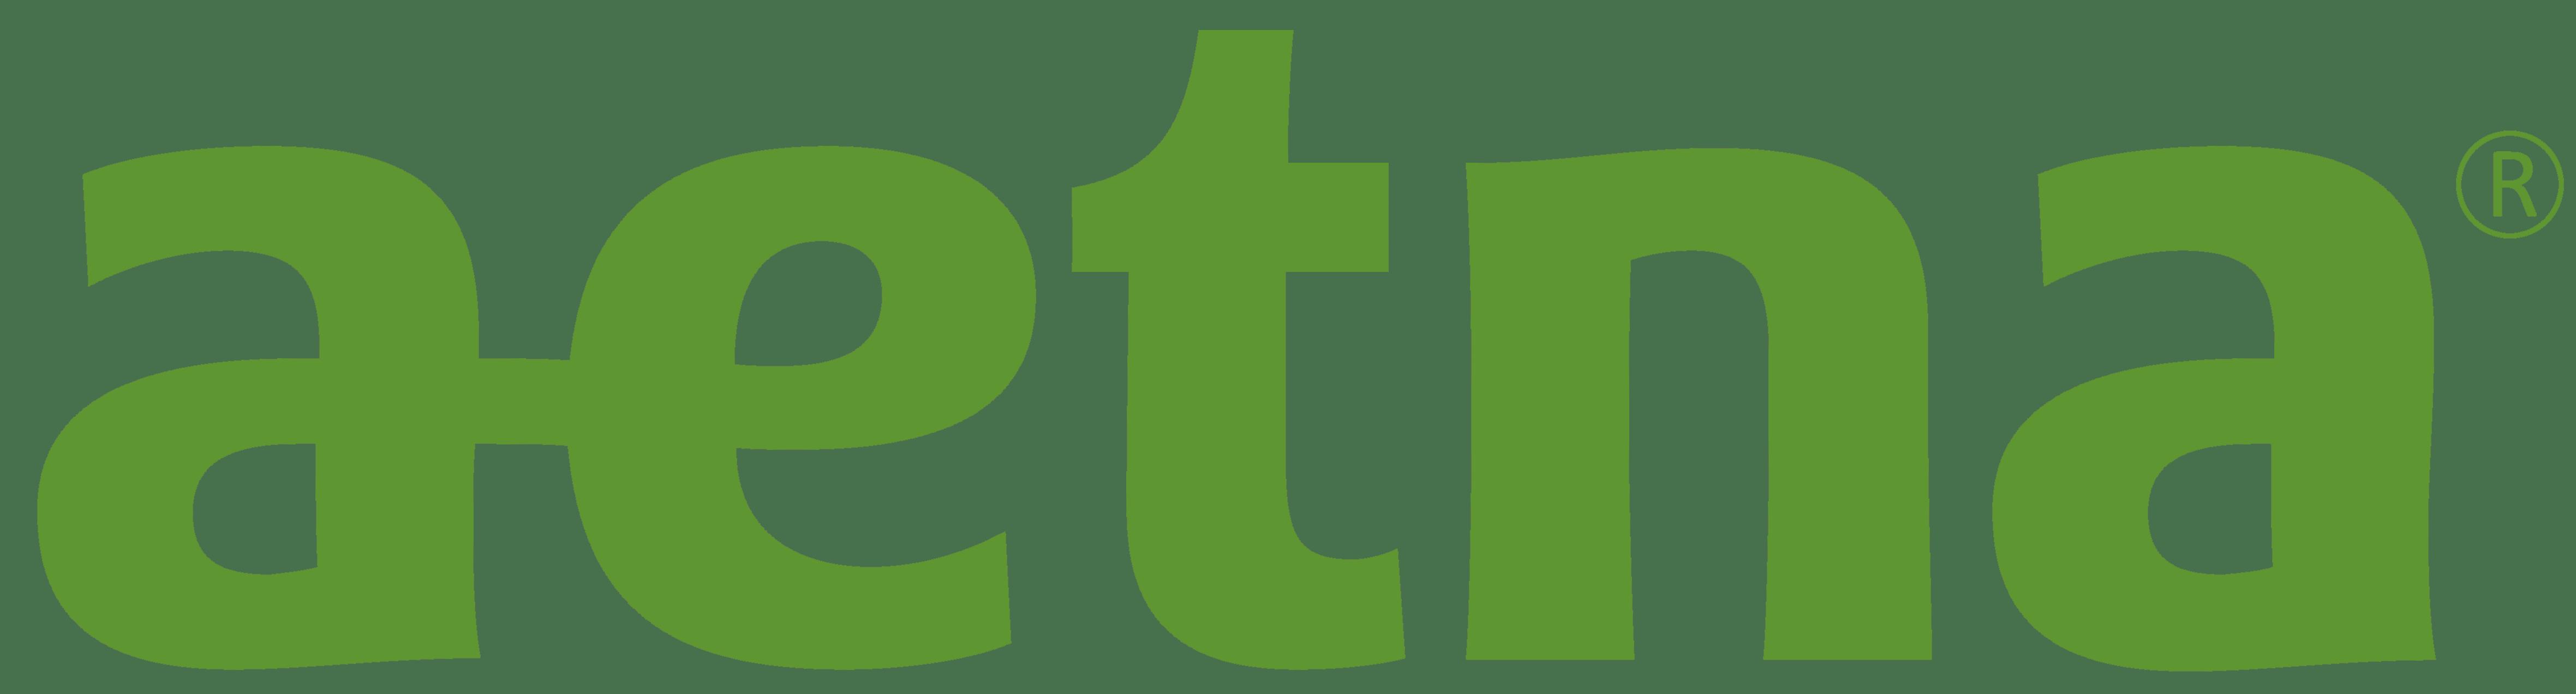 The Aetna Dental Plans | Autos Post